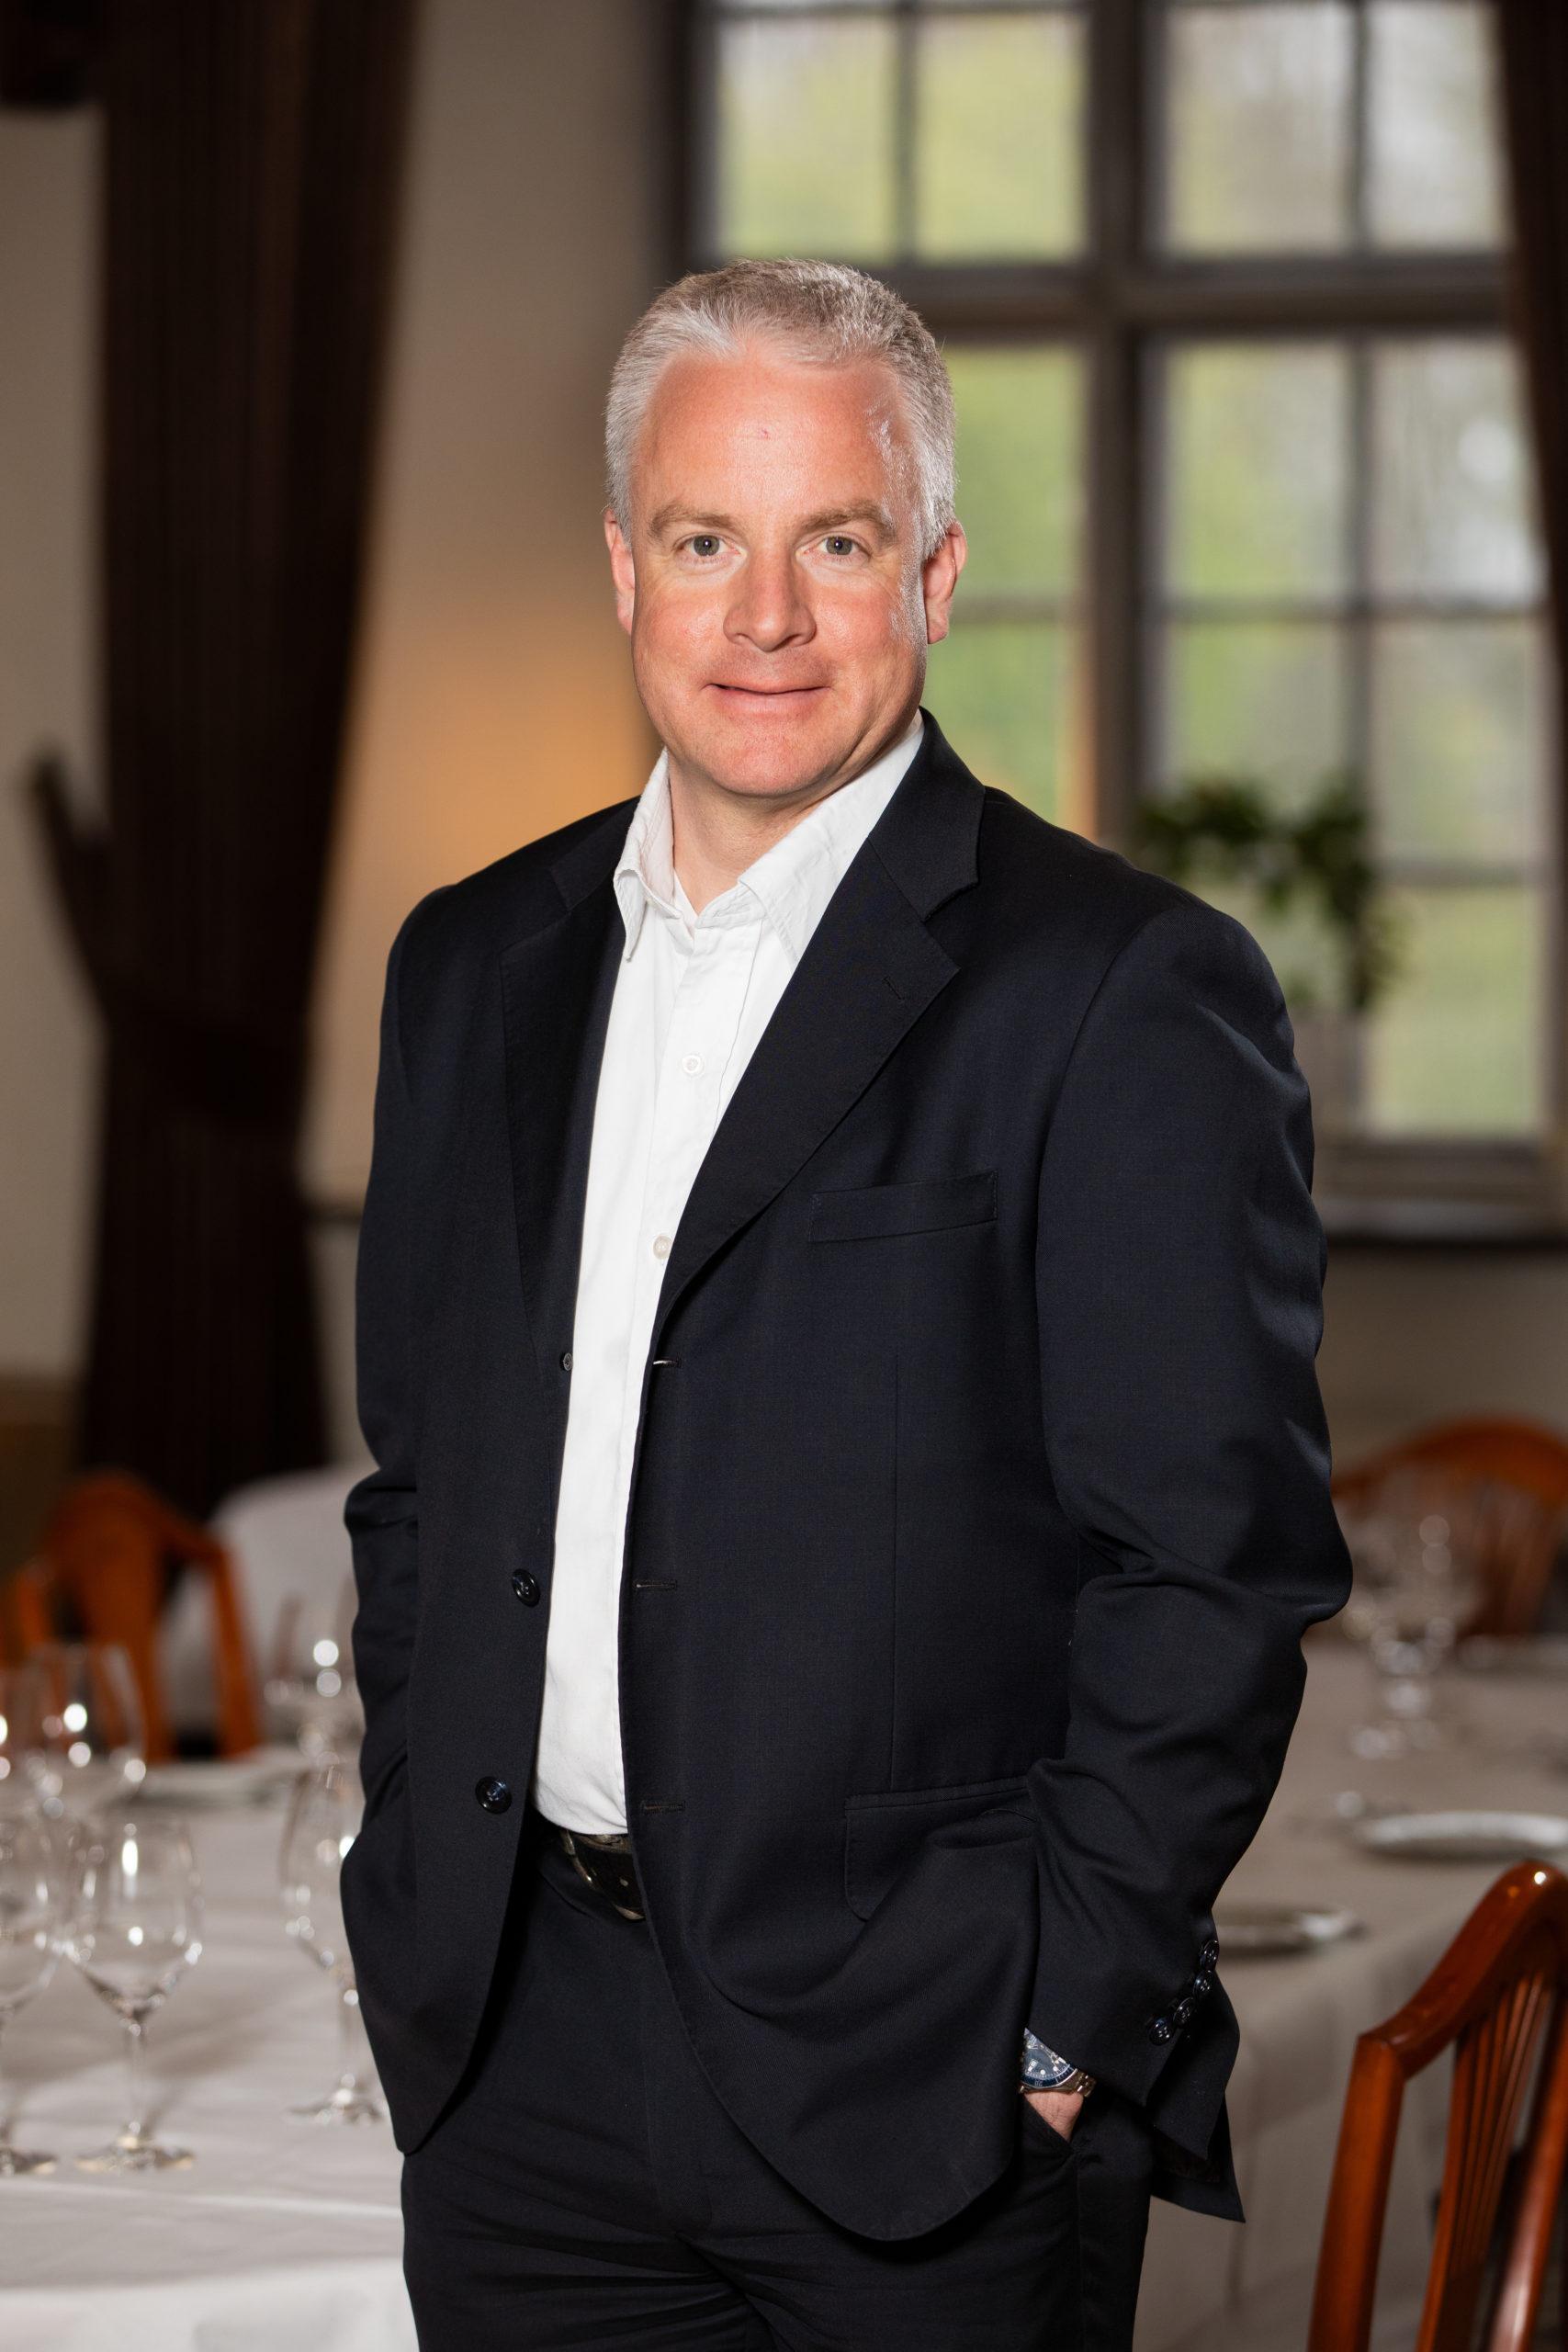 Marcus Holmberg, Founder & Partner Paulmarken Holmberg